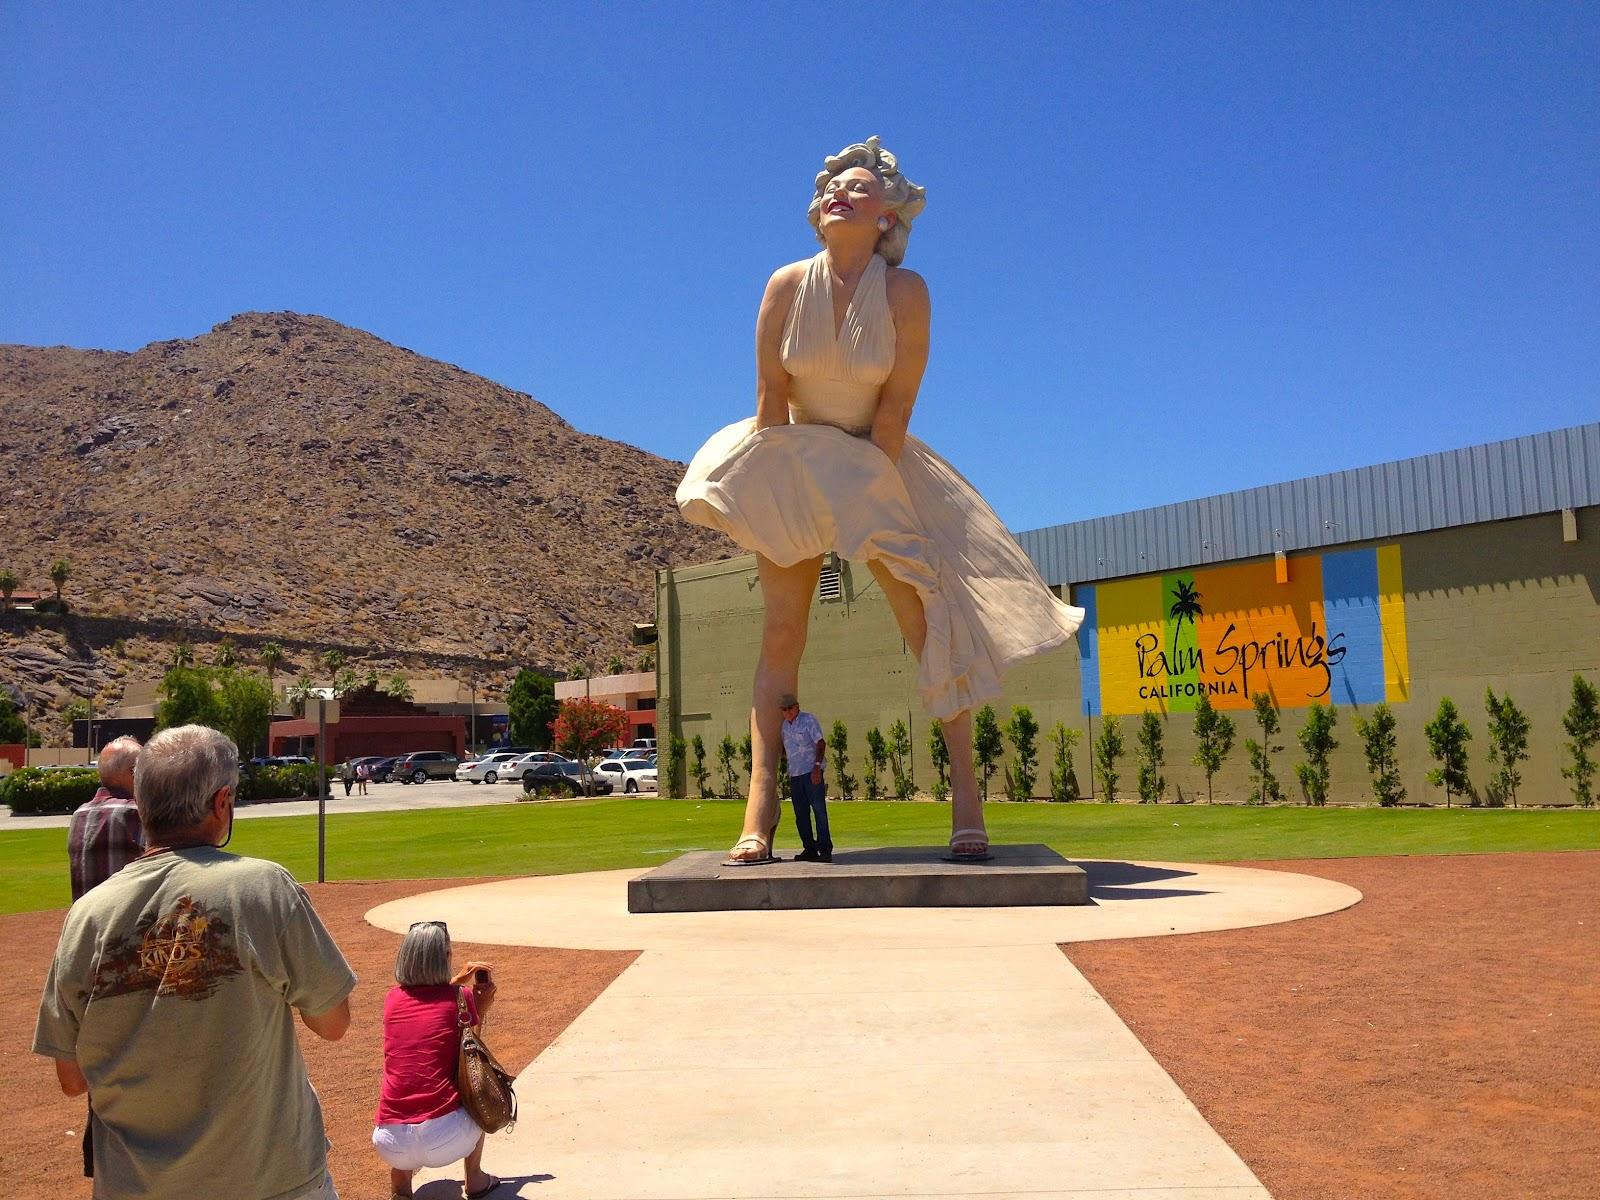 http://3.bp.blogspot.com/-CEyTYlywouk/T9QaYWdjcDI/AAAAAAAAbjA/b5X6eejke4I/s1600/marilyn-monroe-statue-palm-springs-ca.jpg